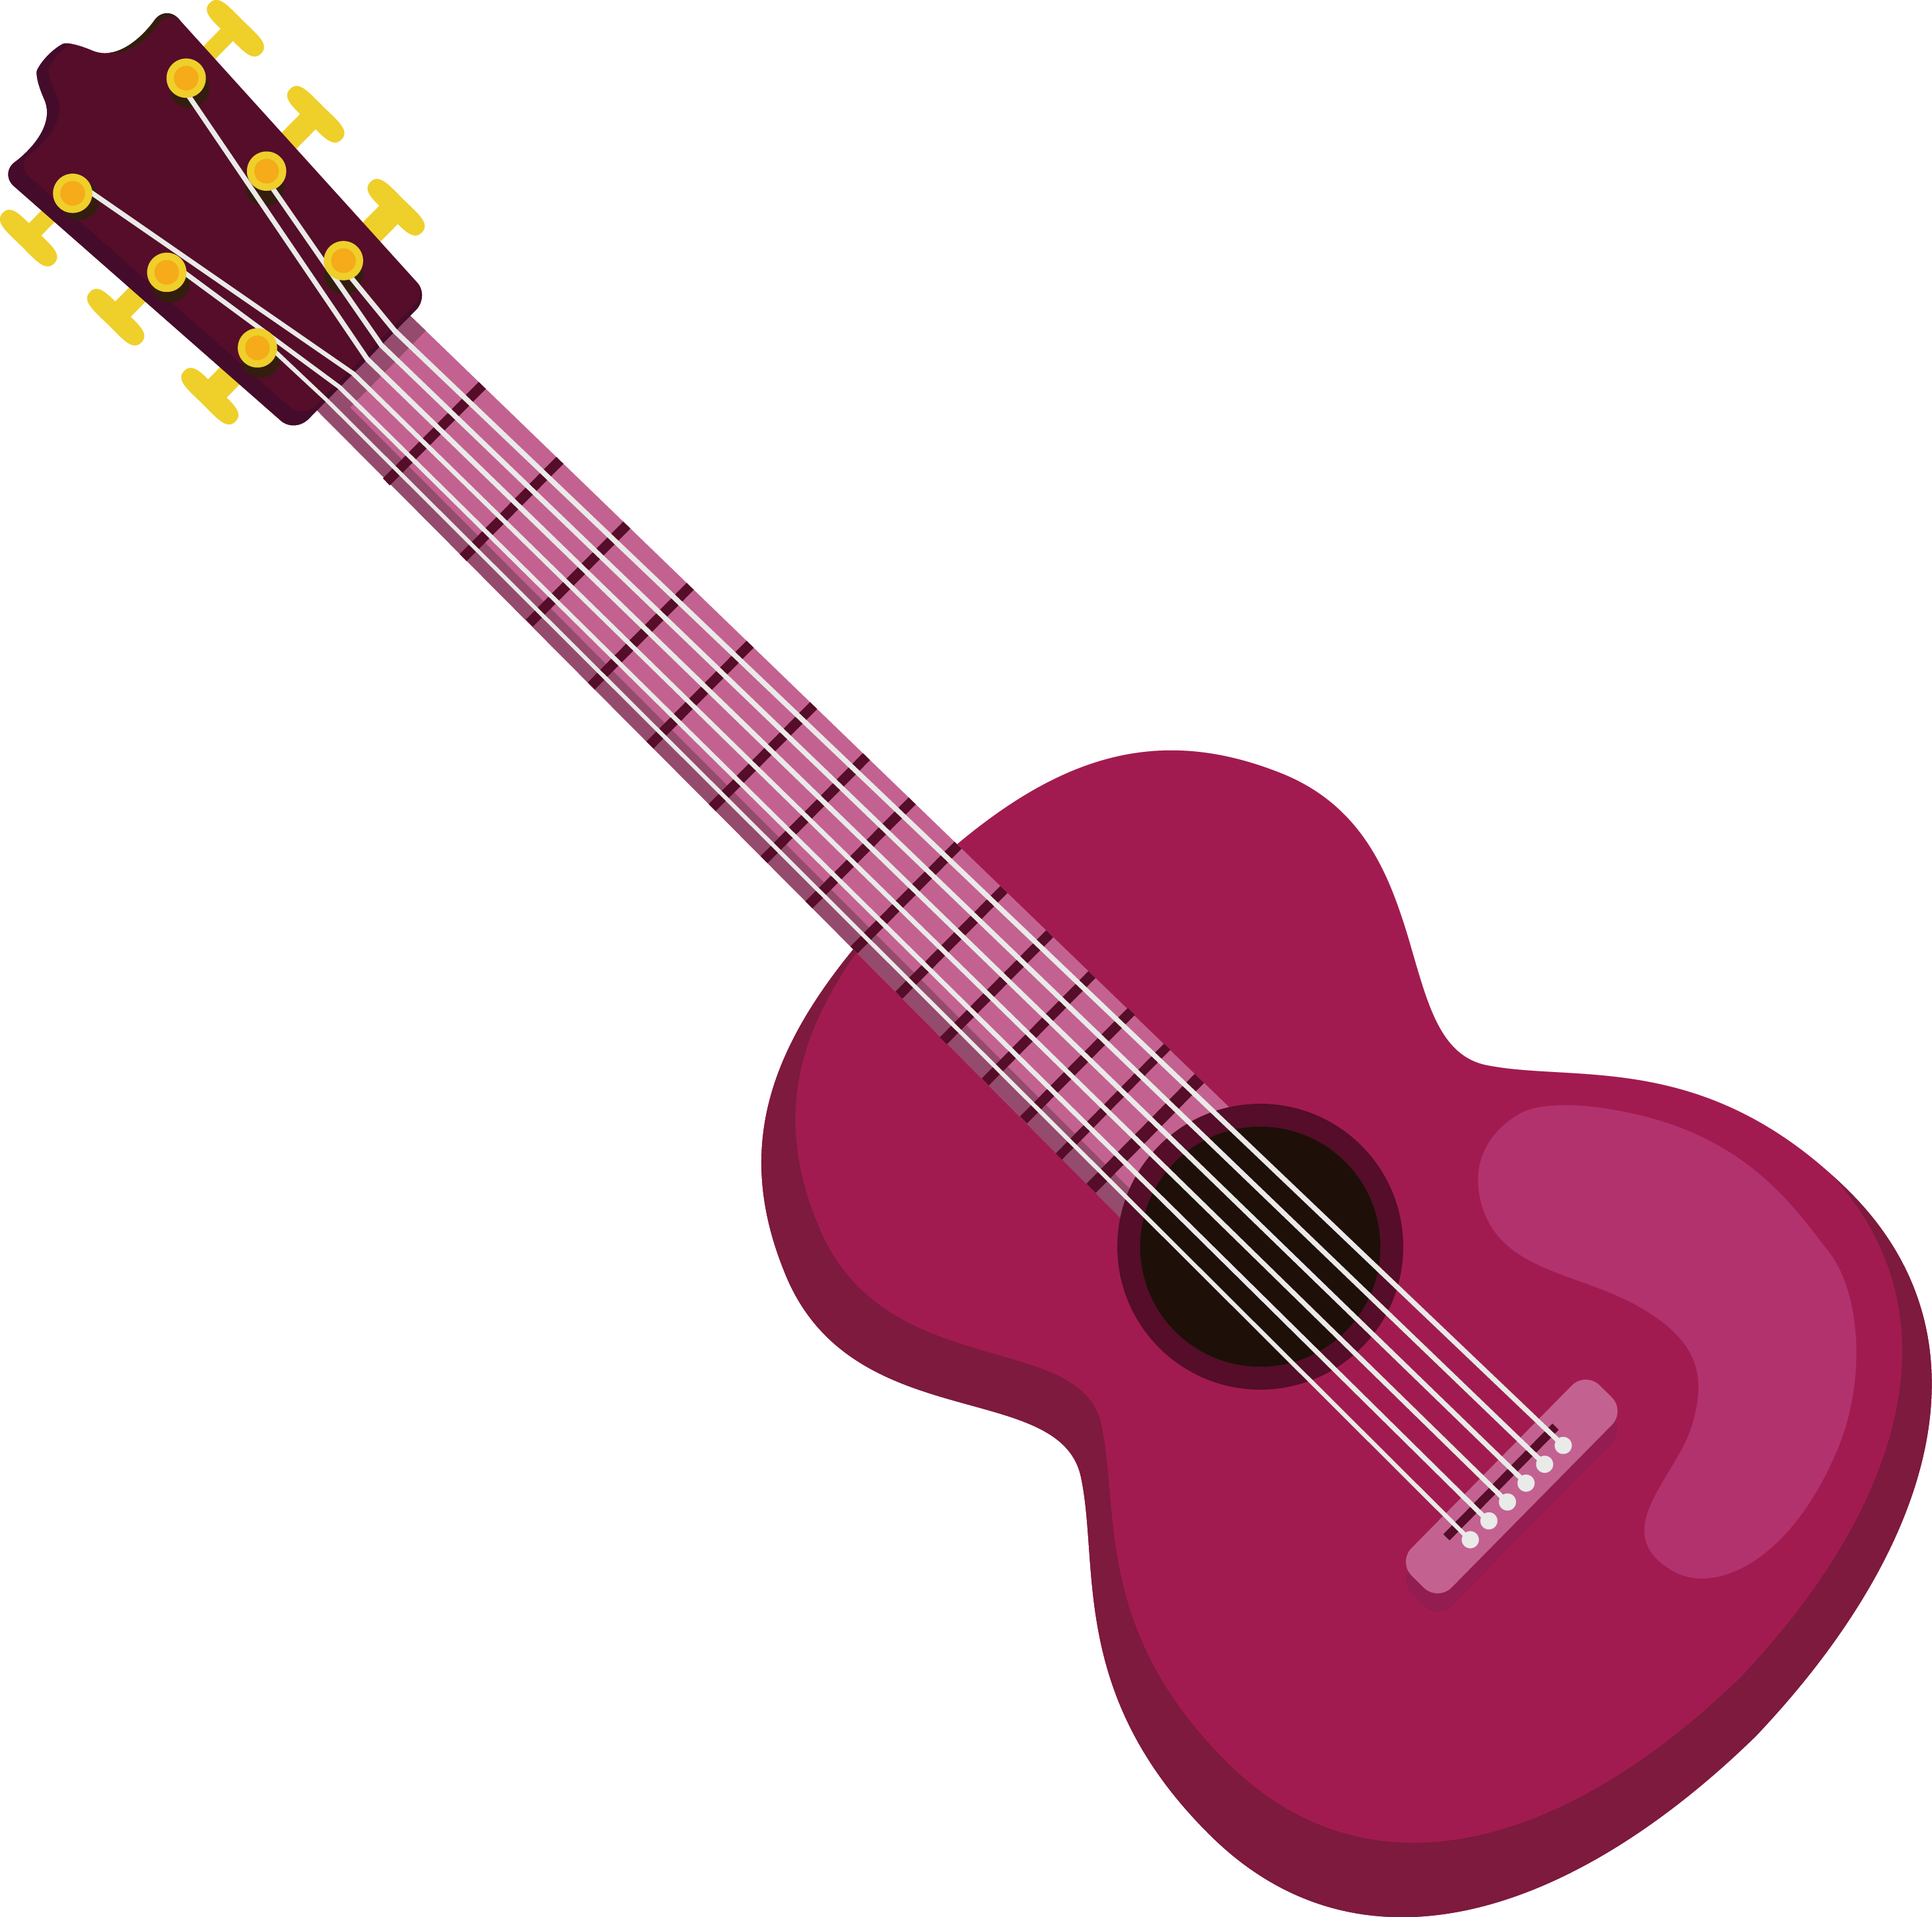 Ukulele clipart vector clip art freeuse stock Download Tiple Electric Ukulele Guitar Vector J-45 Acoustic ... clip art freeuse stock